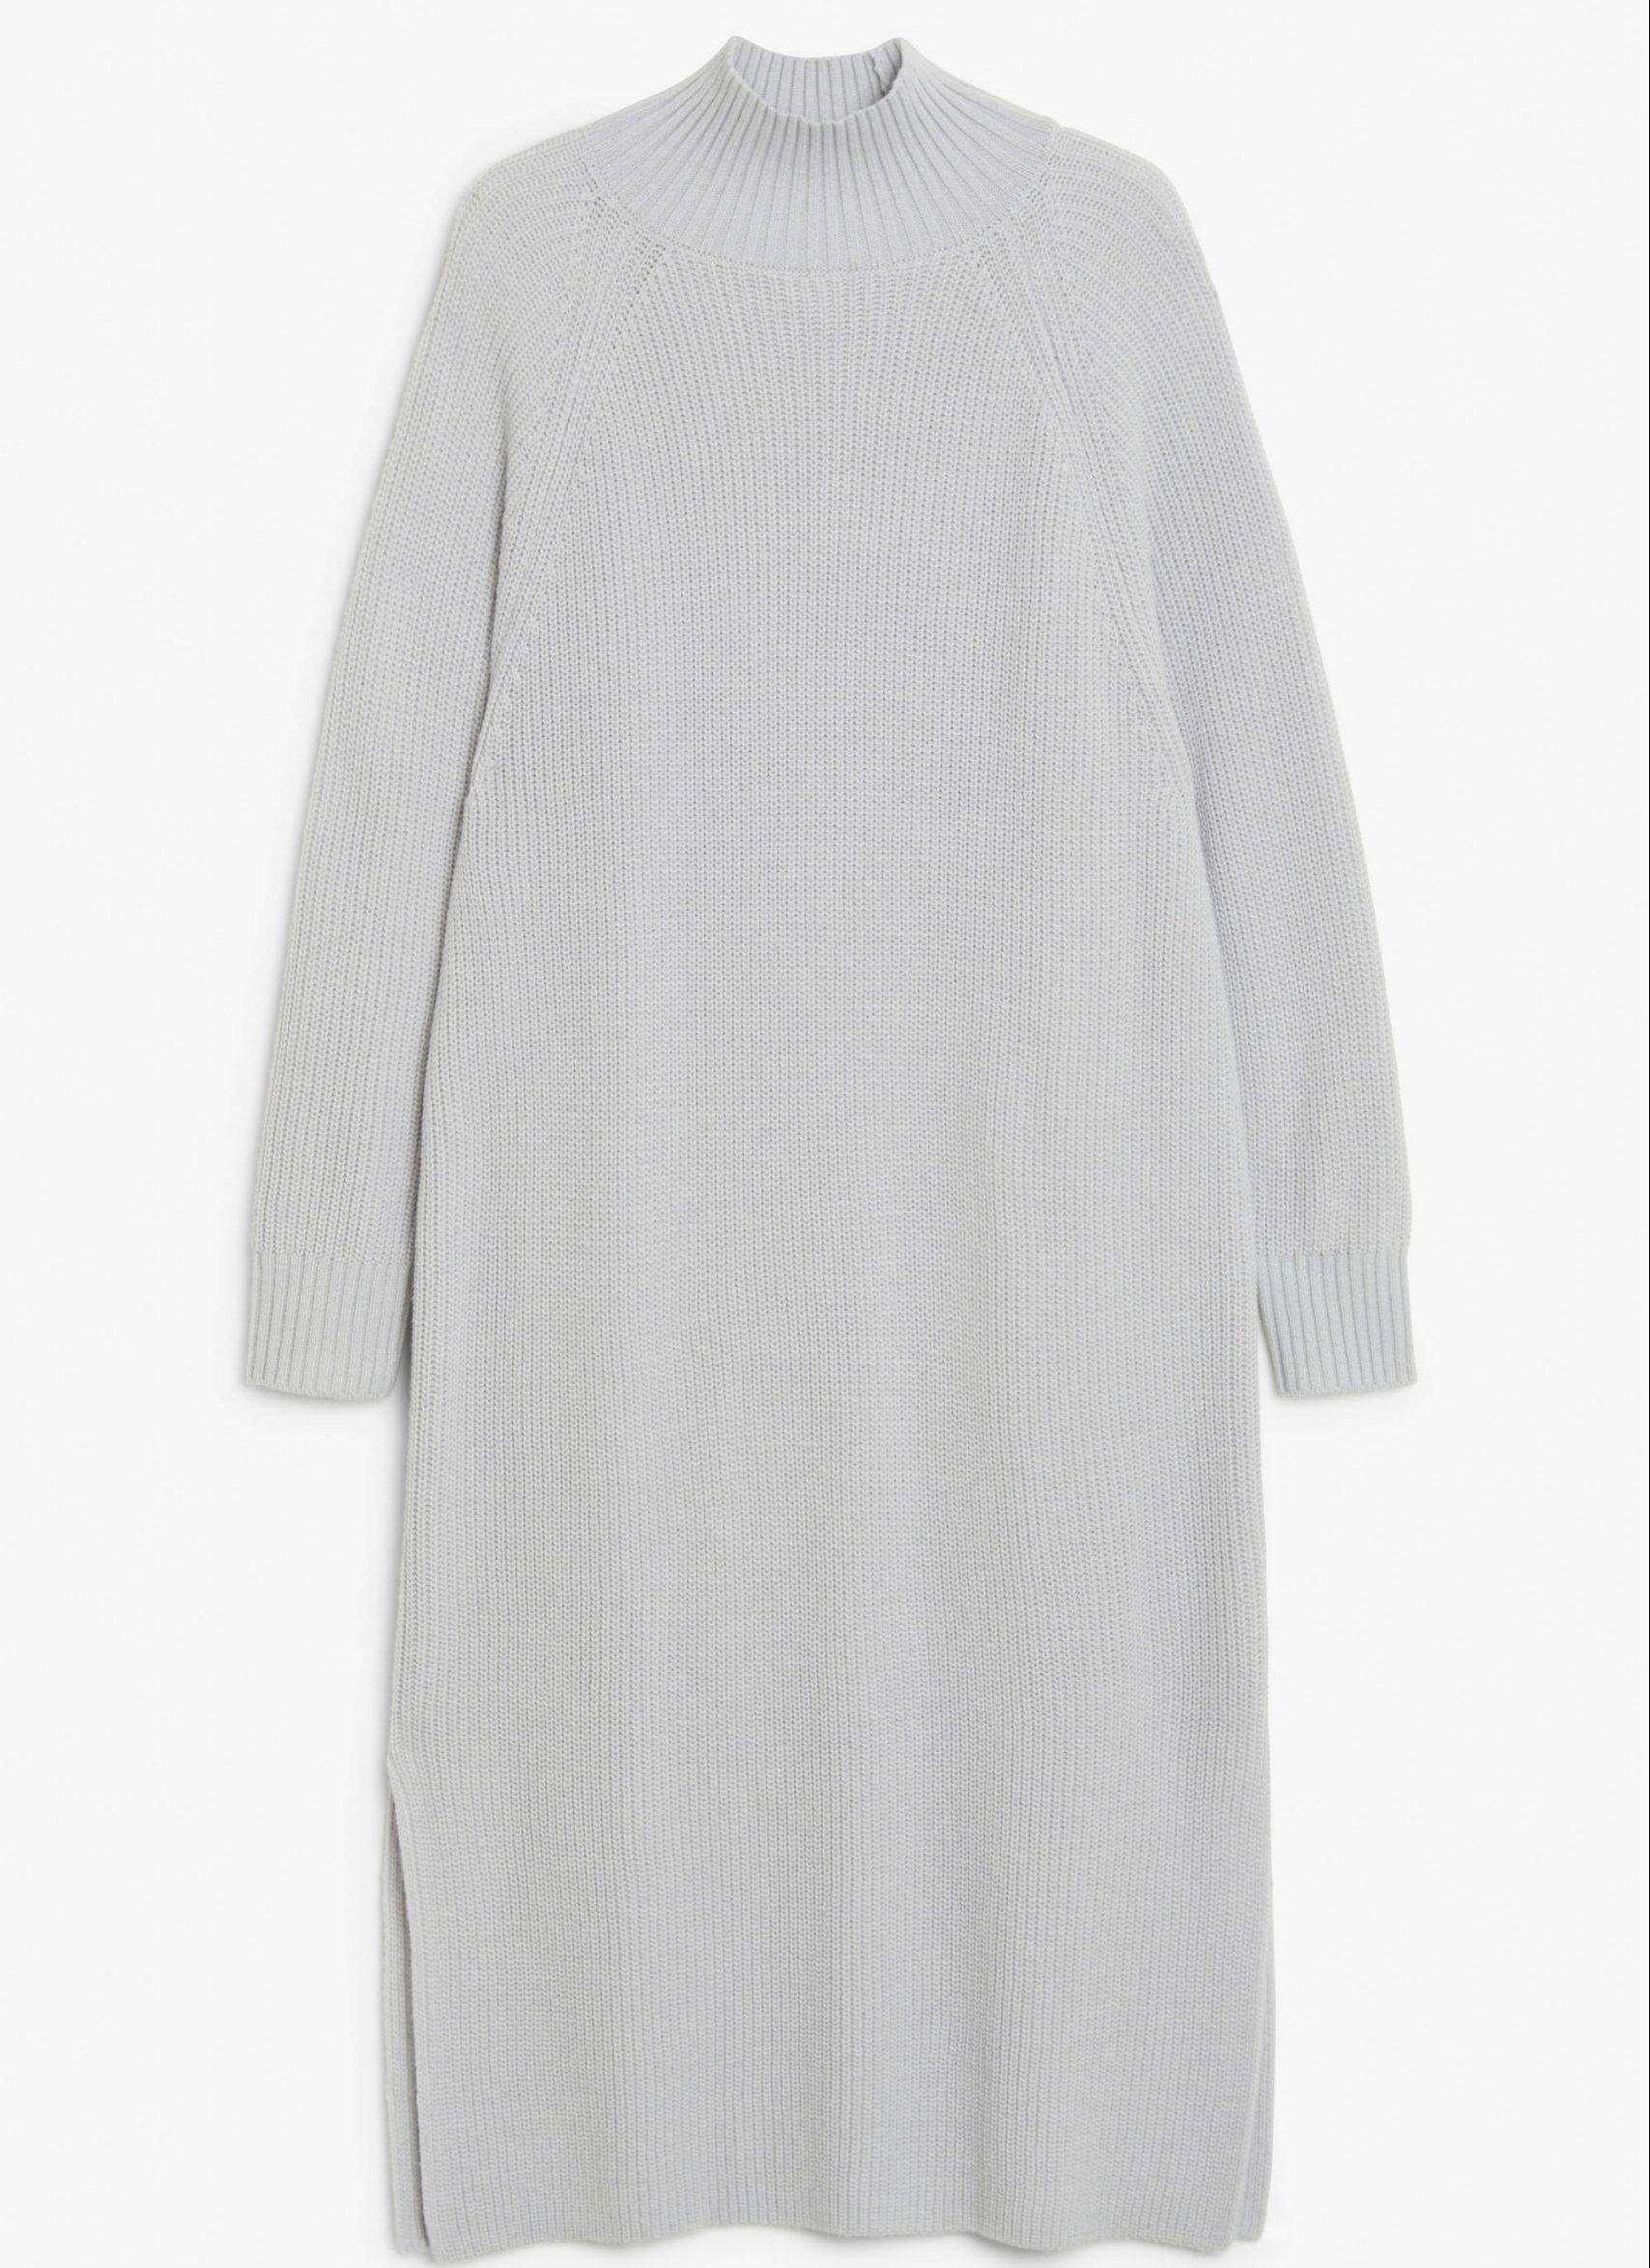 monki, kjole, strik